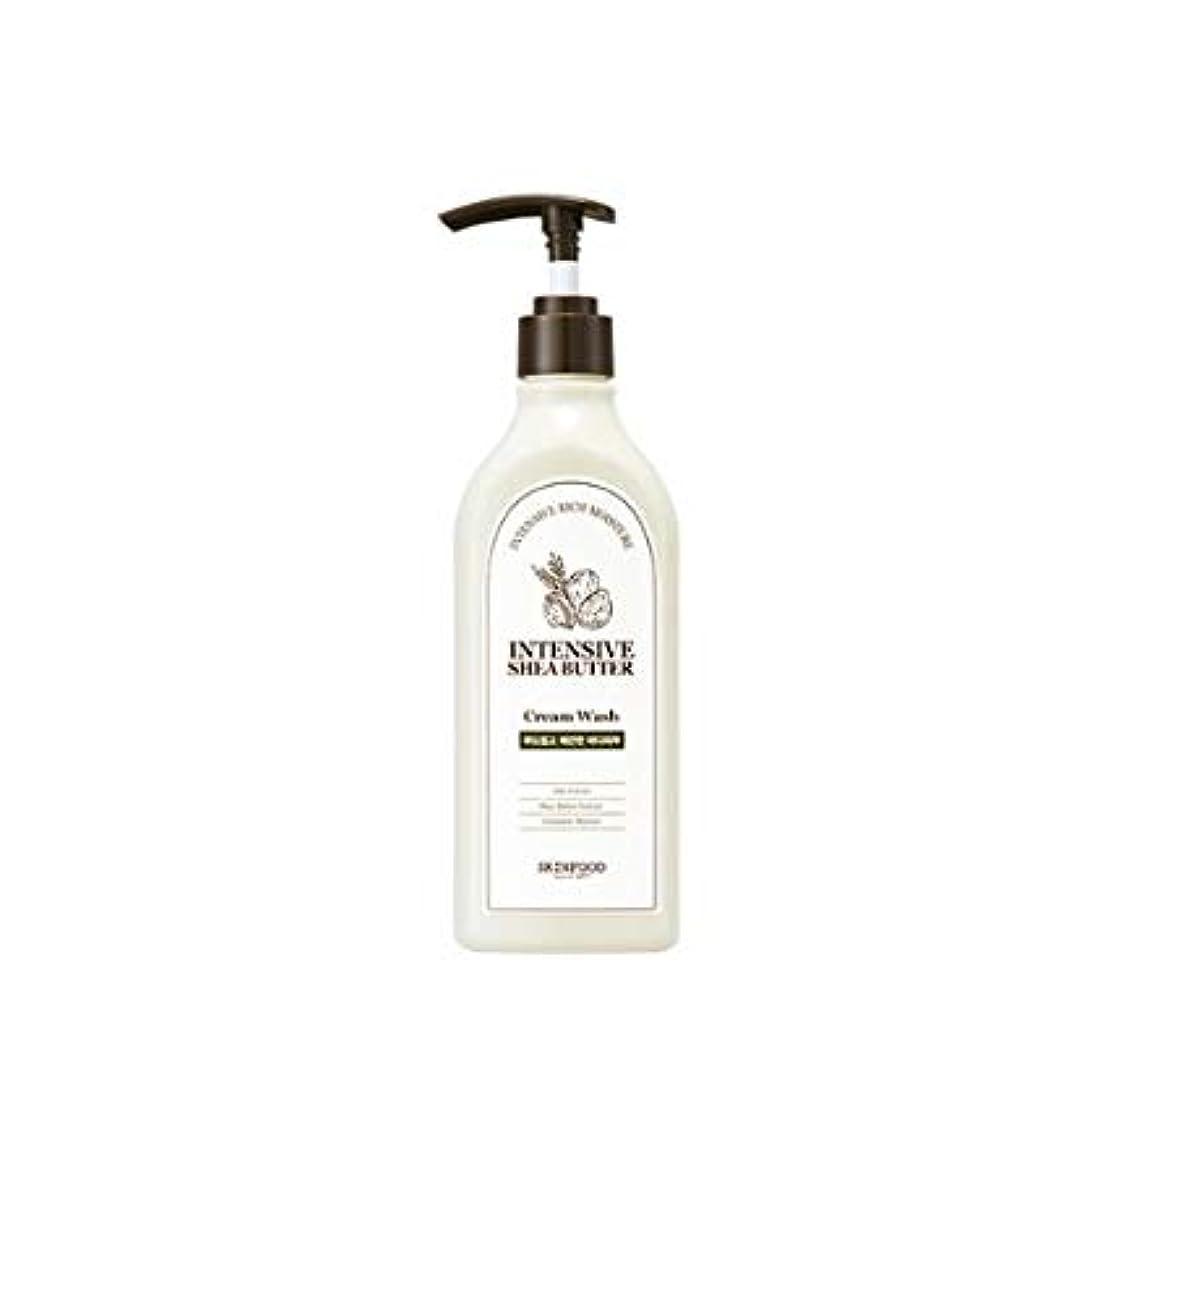 Skinfood 集中シアバタークリームウォッシュ/Intensive Shea Butter Cream Wash 335ml [並行輸入品]